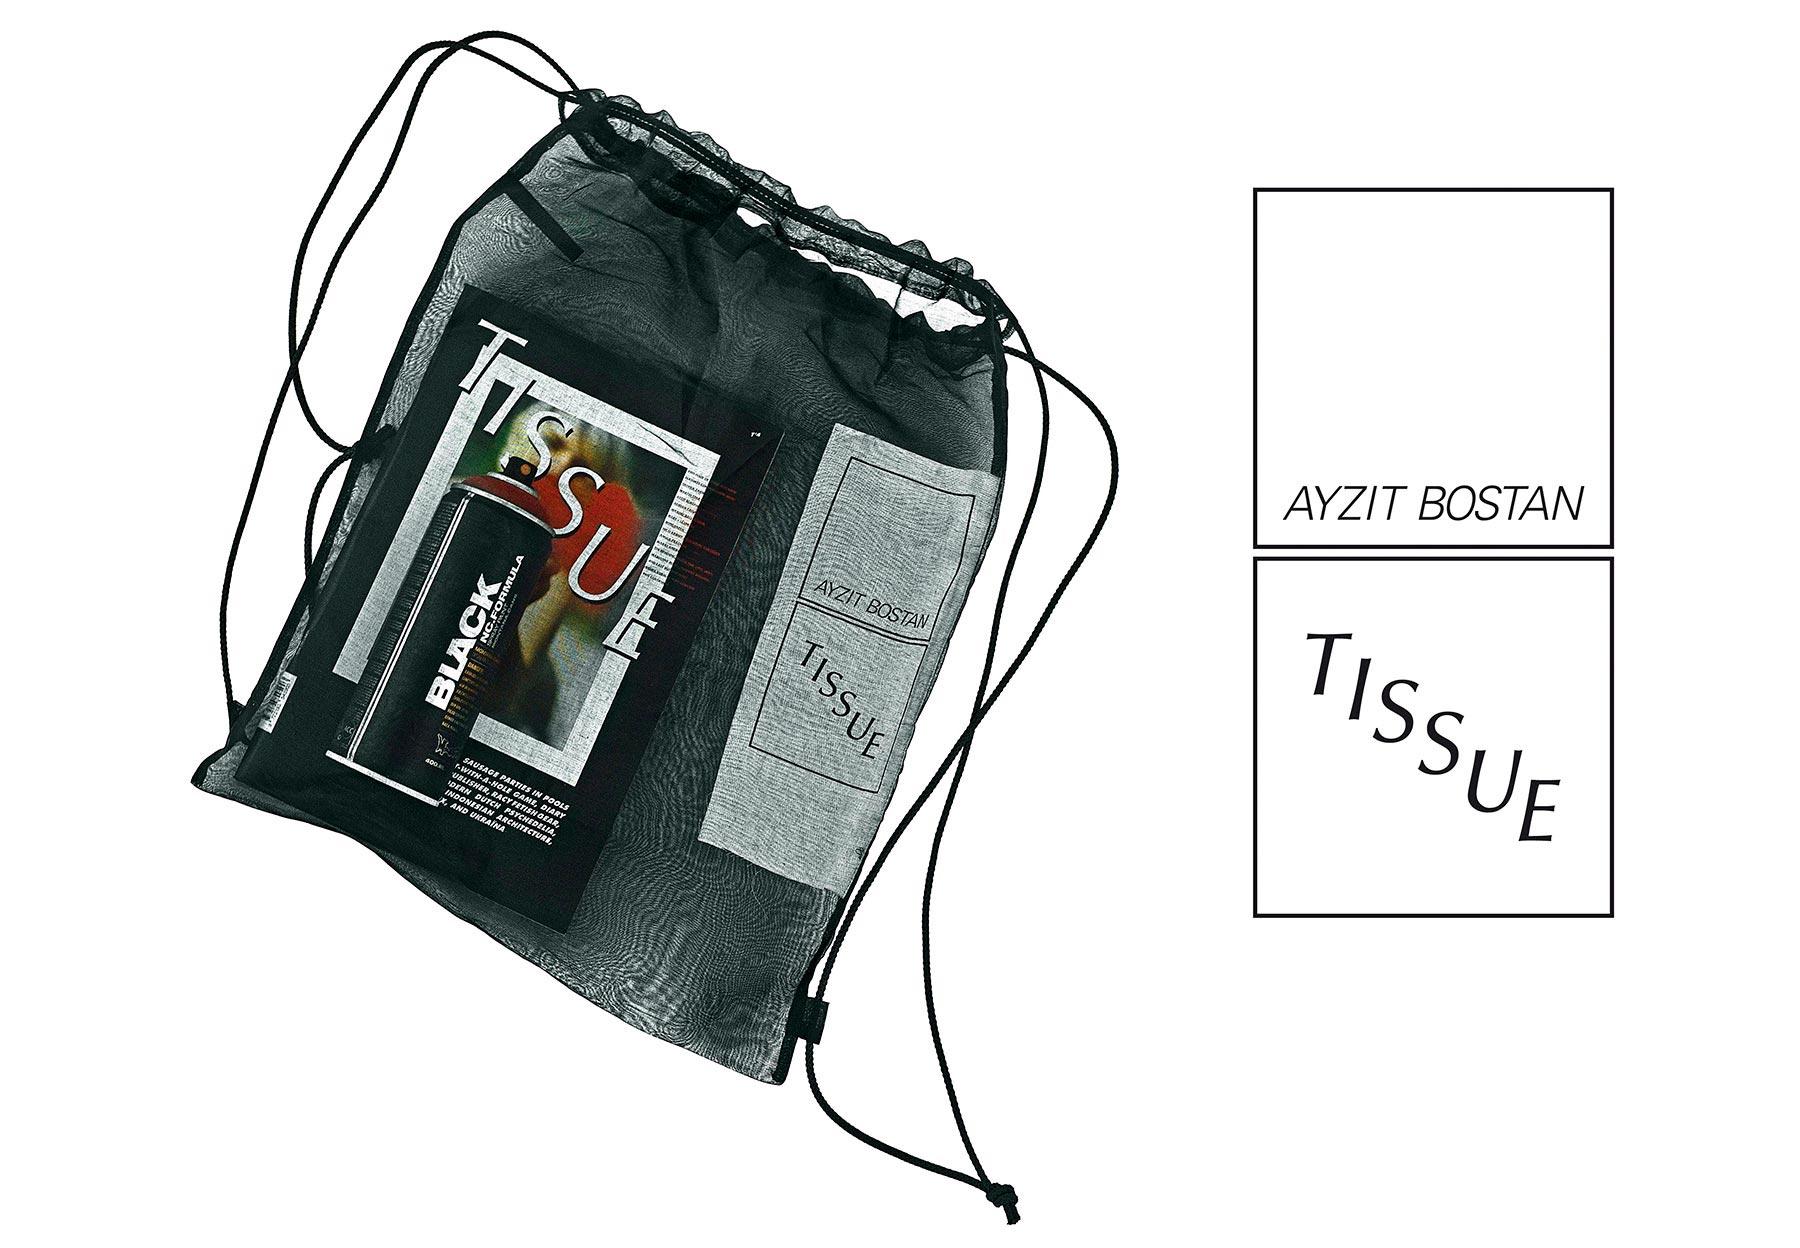 TISSUE_AYZIT-BOSTAN_logo_kl